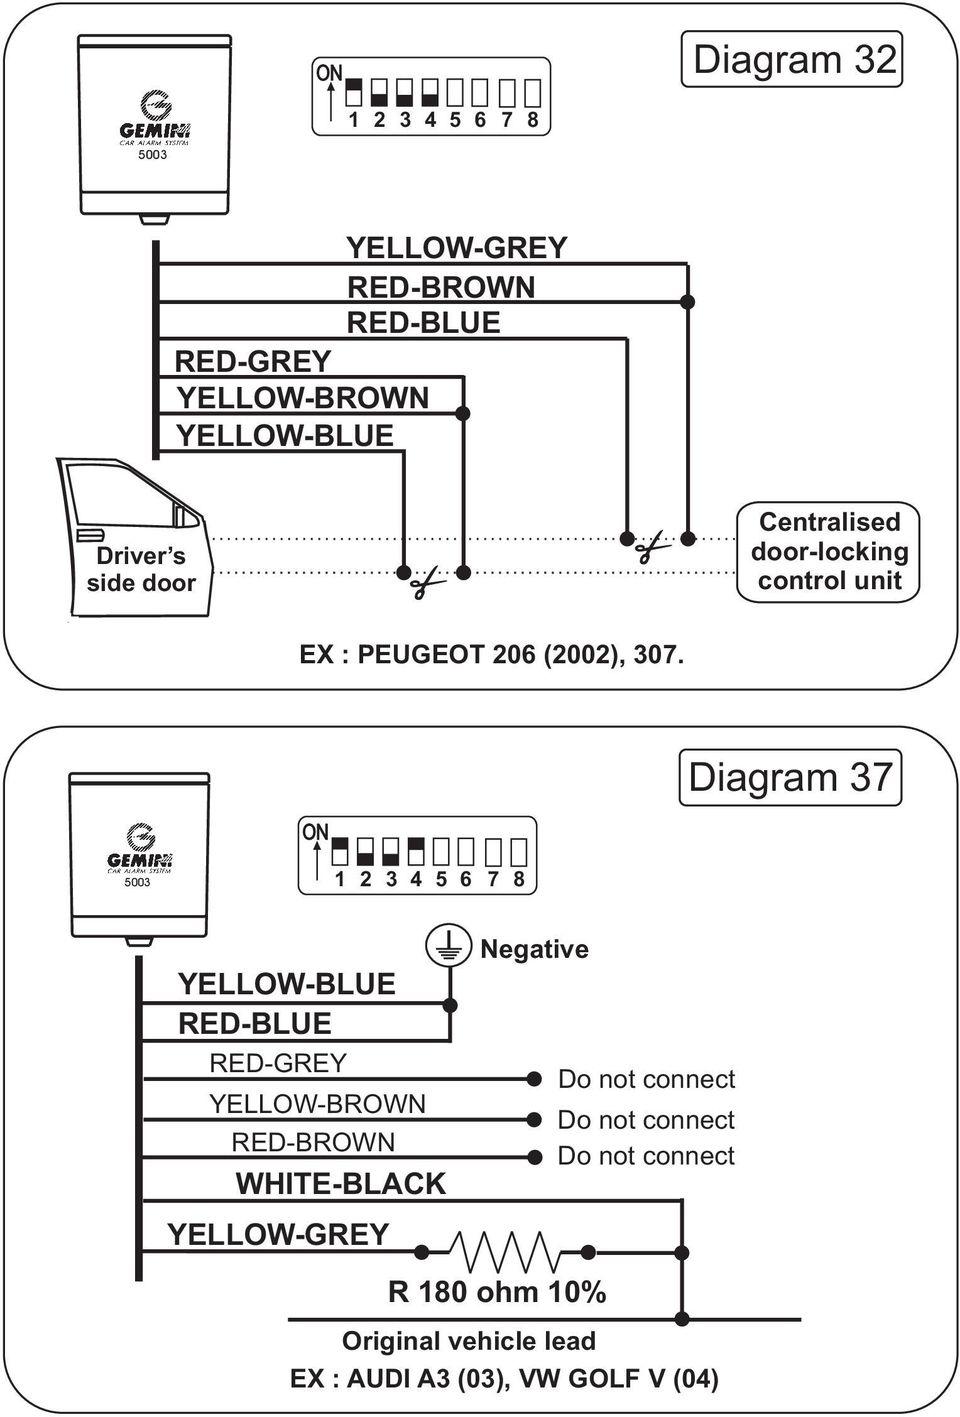 hight resolution of 5002 3 installation instructions pdf 2002 307 skoda fabia central locking wiring diagram